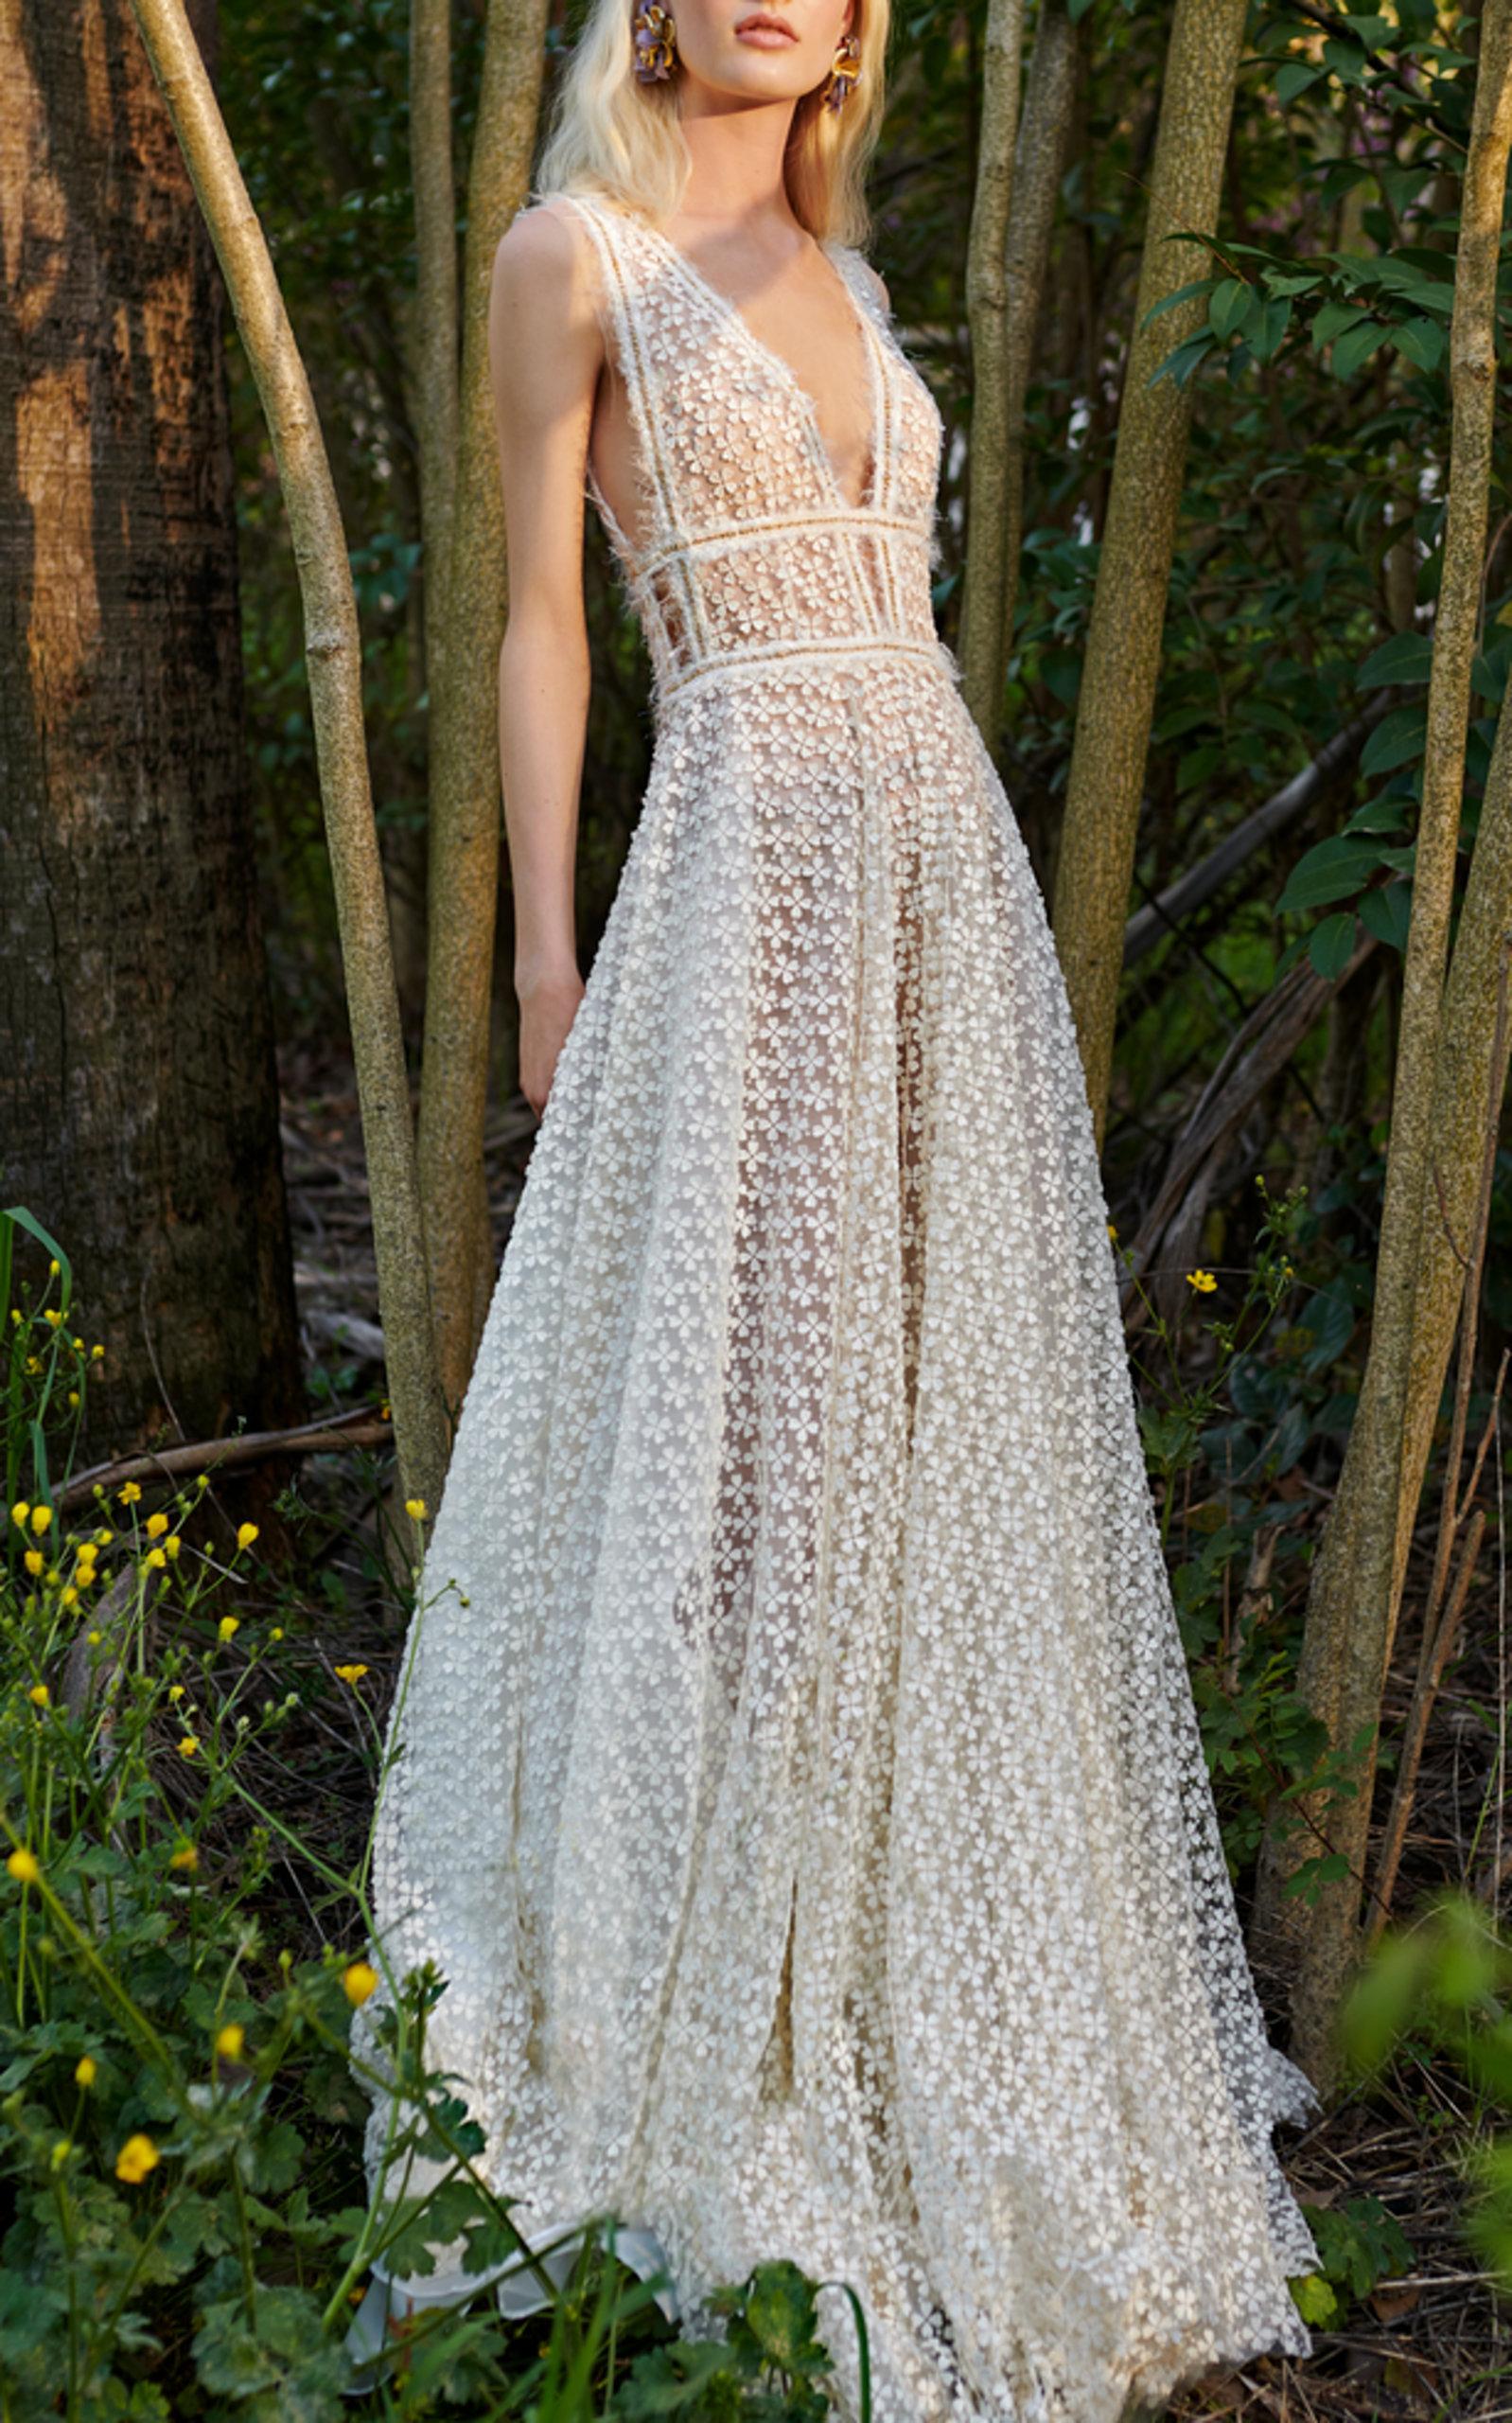 COSTARELLOS BRIDAL FLOWER LACE A-LINE DRESS